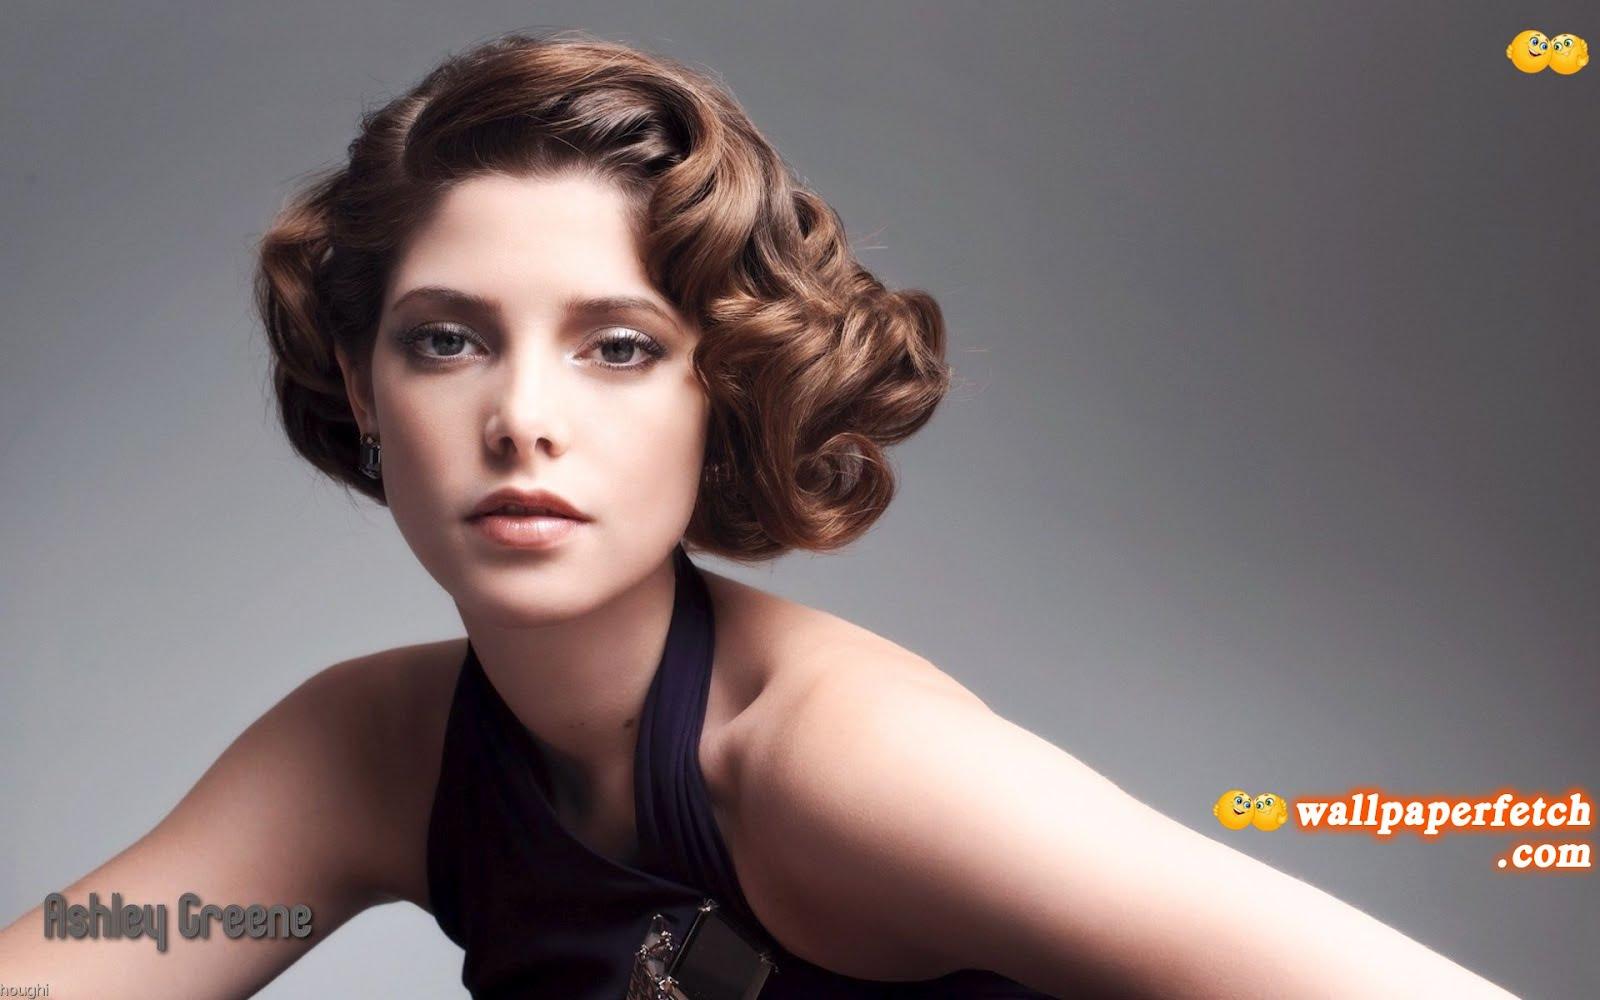 http://3.bp.blogspot.com/-10R1jOJFulo/UArWPB1-5SI/AAAAAAAAGjM/m7CtLv0T_gQ/s1600/ashley-greene-beautiful-girl_1920x1200_90009.jpg